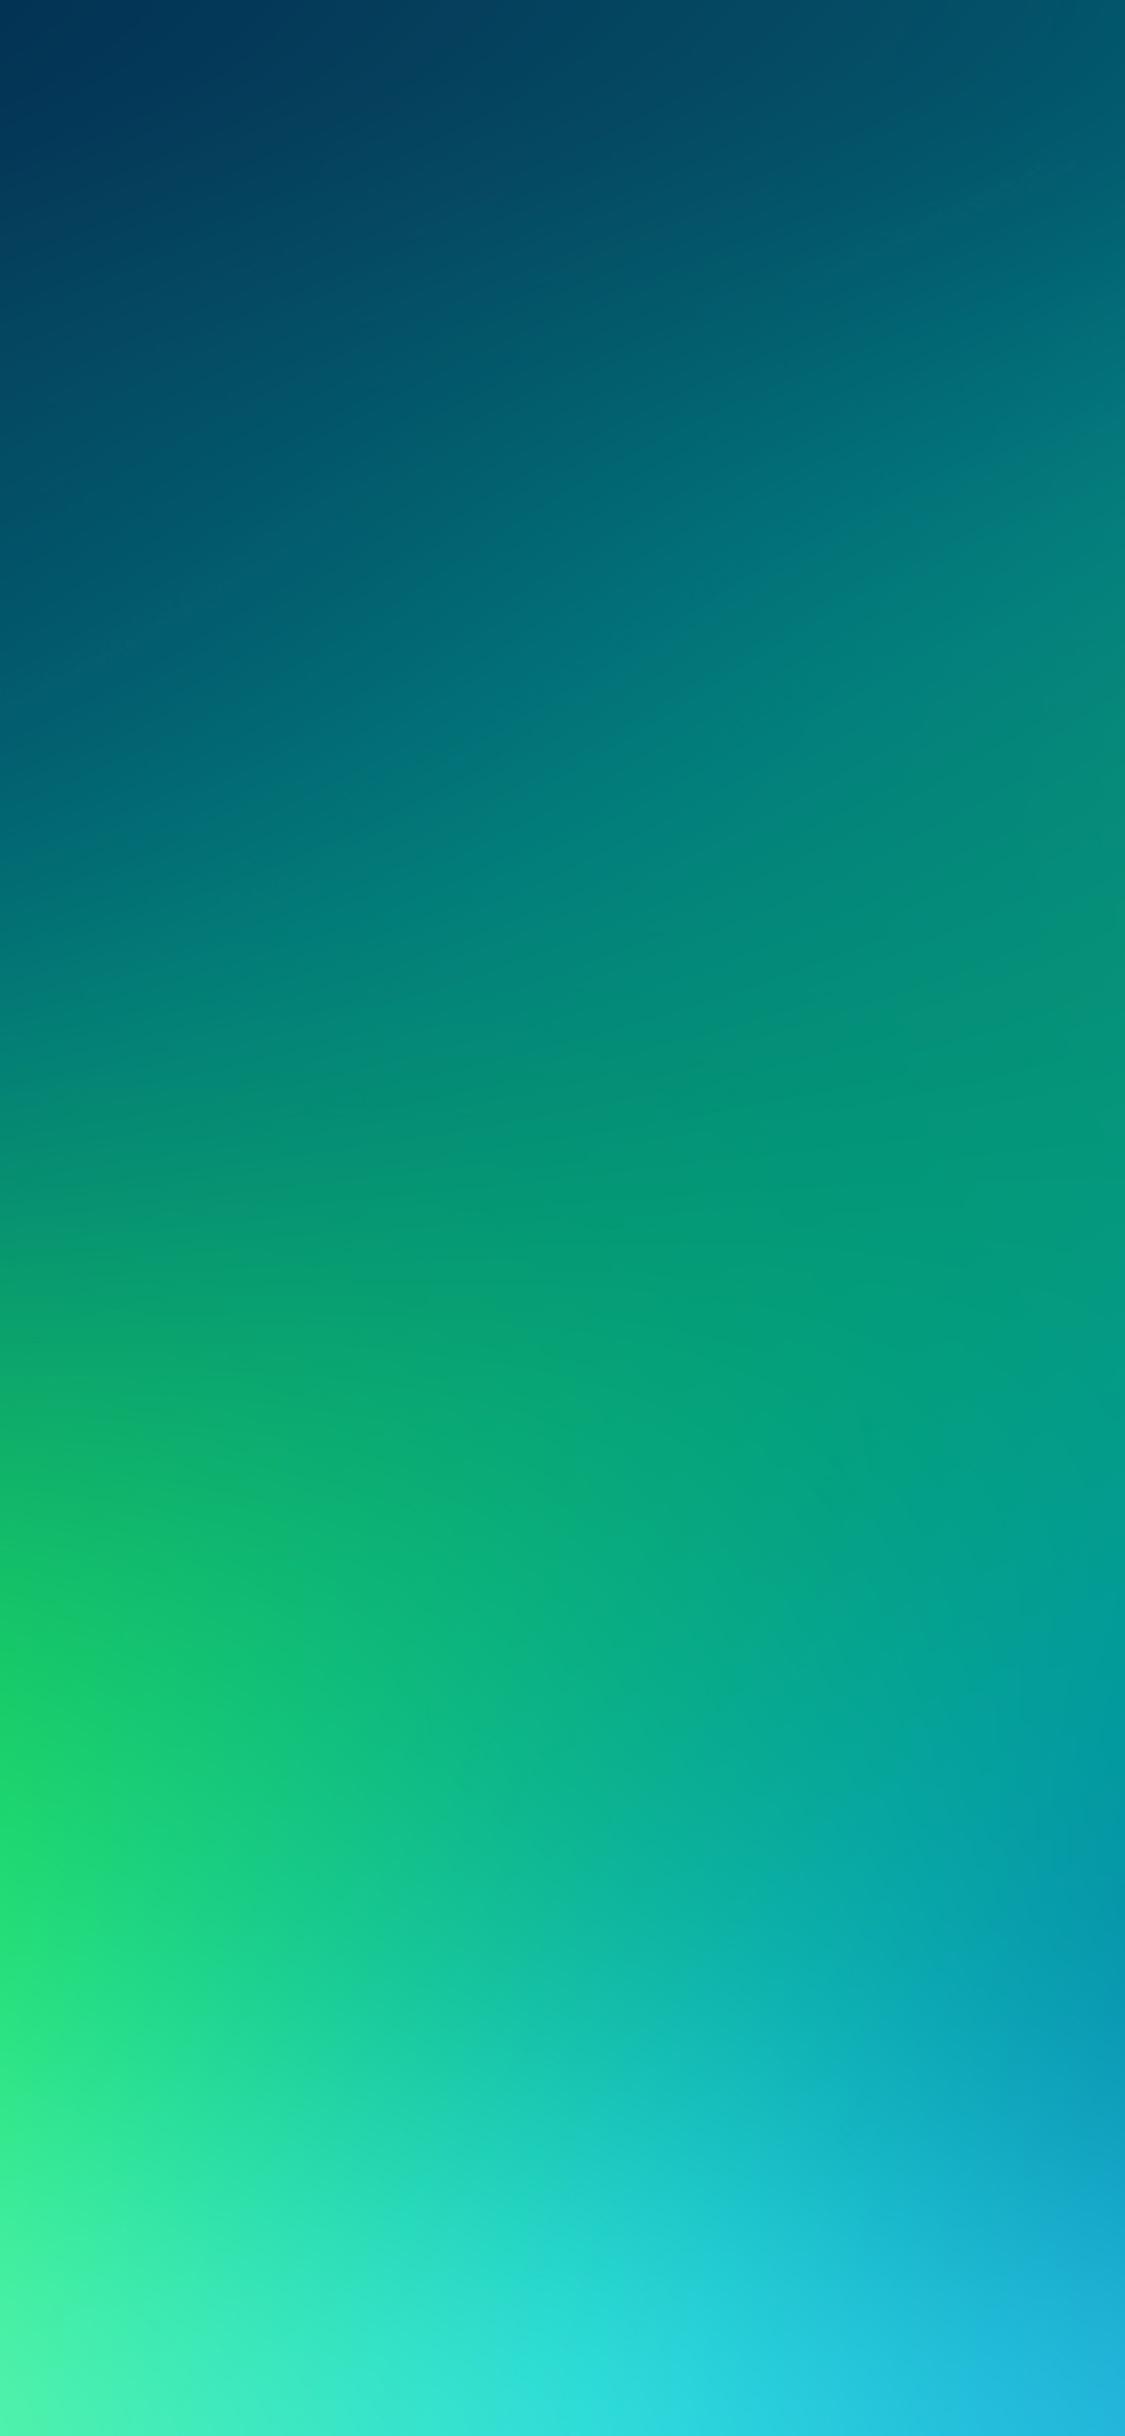 iPhoneXpapers.com-Apple-iPhone-wallpaper-sb24-wallpaper-flower-glowing-blue-blur